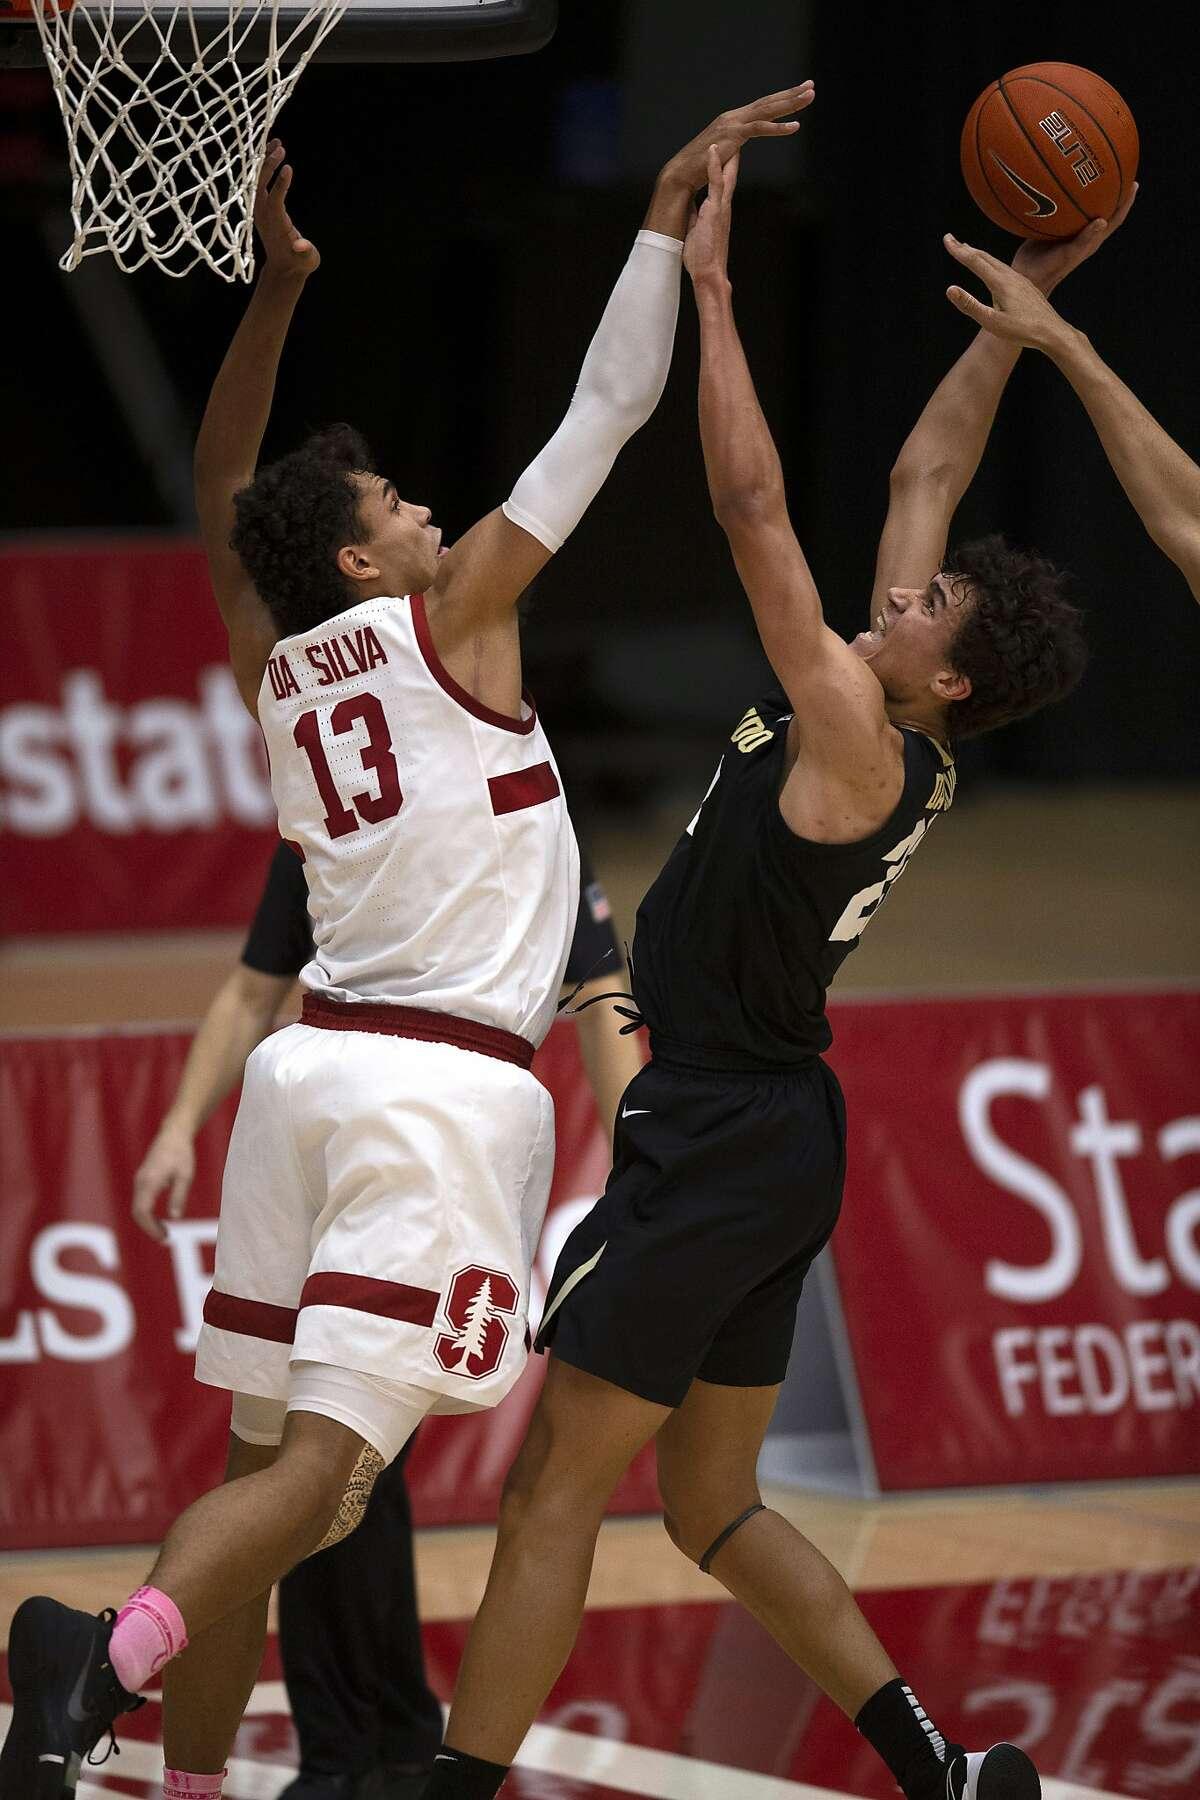 Colorado's Tristan da Silva (right) attempts to shoot over Stanford's Oscar da Silva during the Buffaloes' 69-51 win.